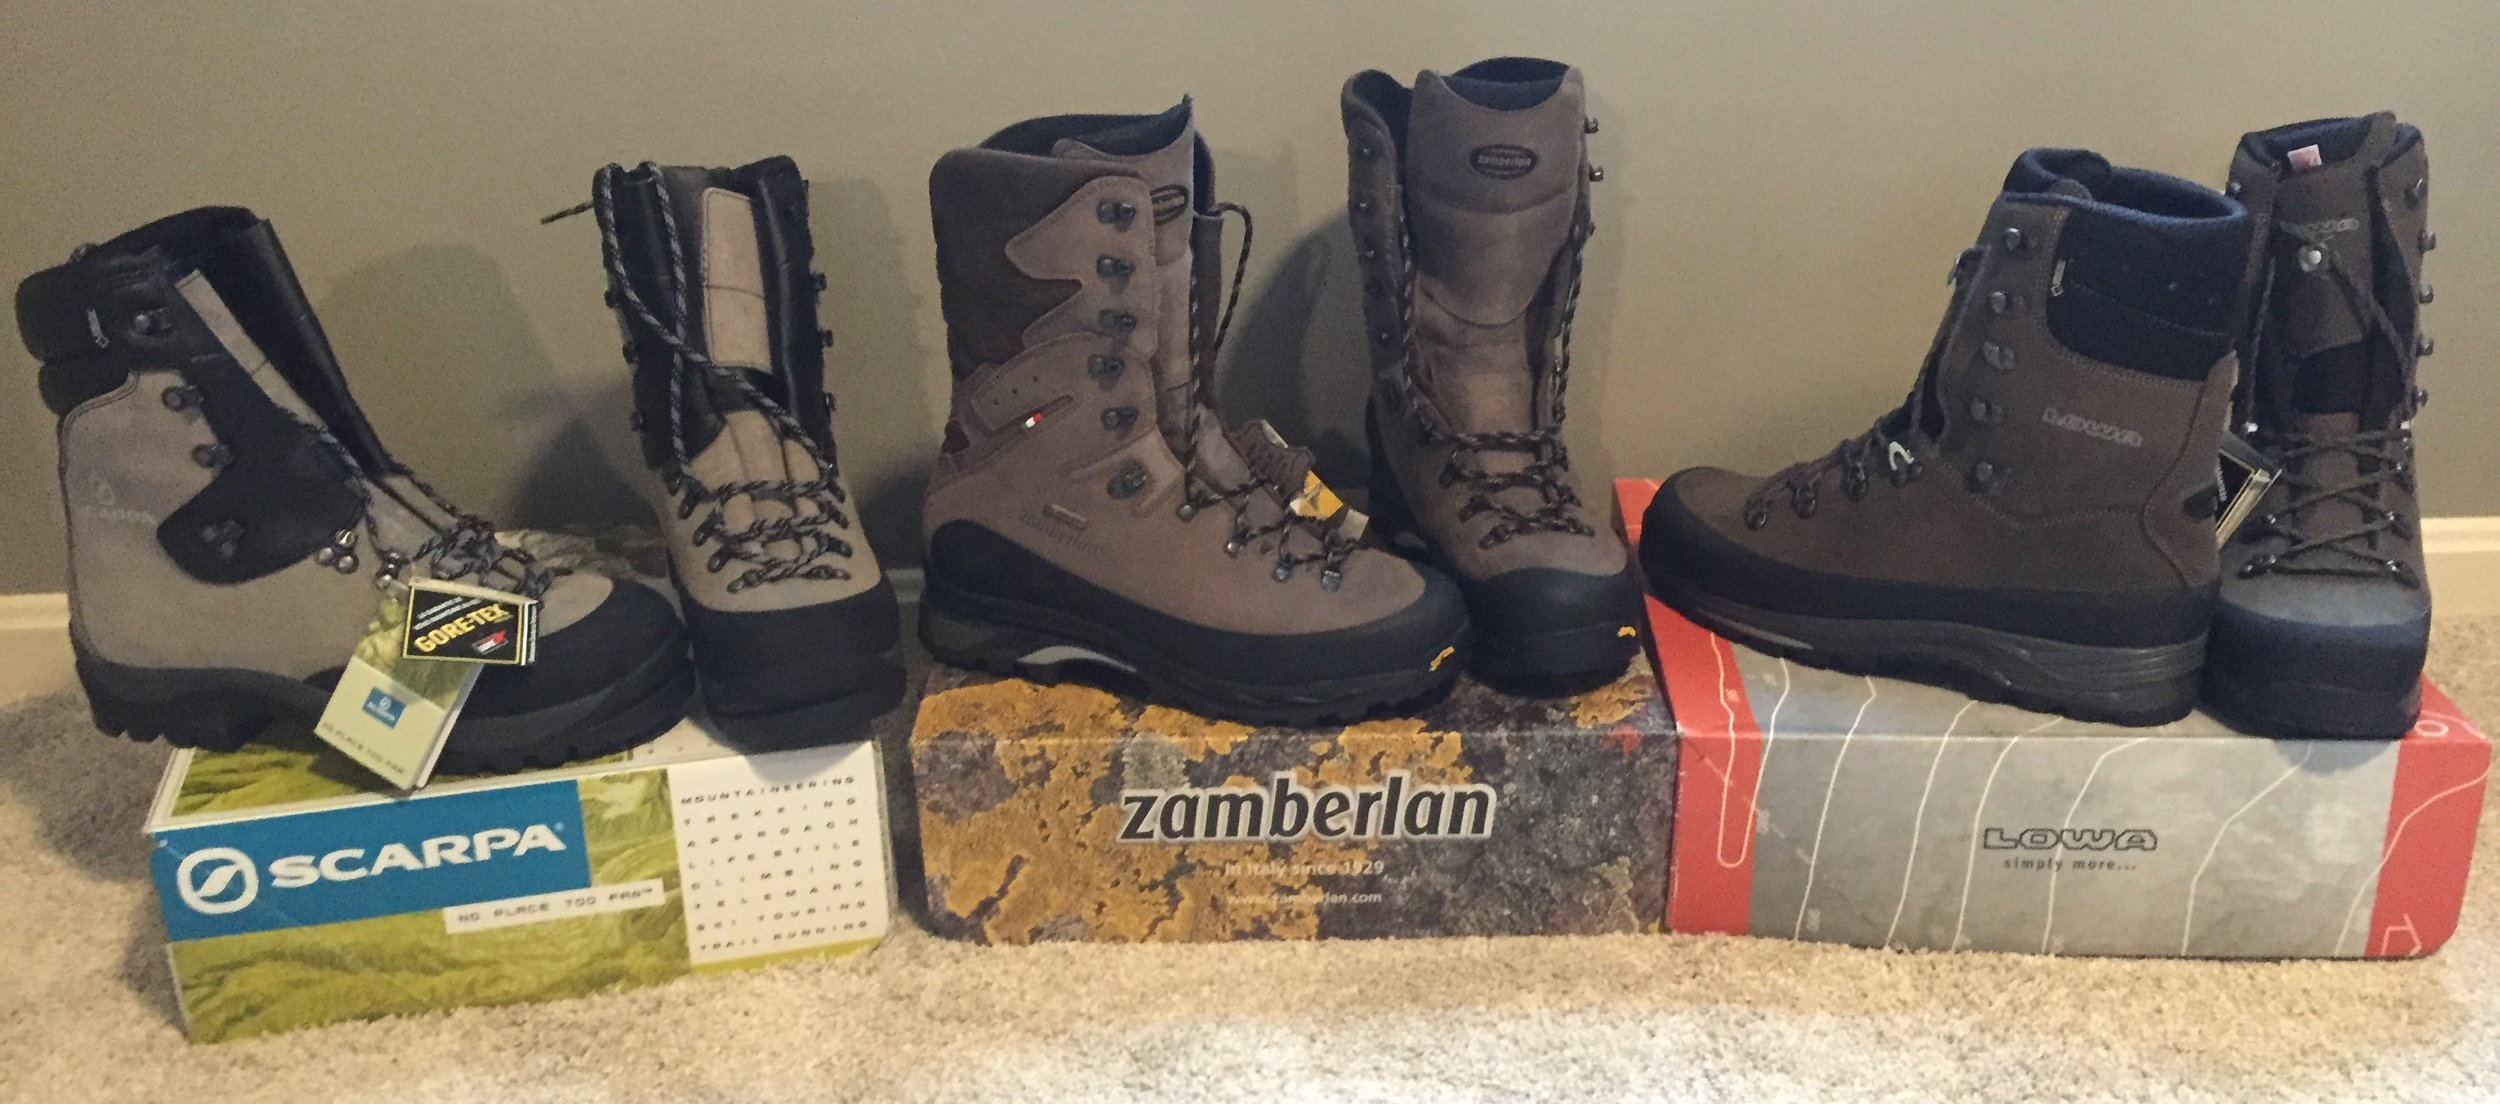 (L-R) Scarpa Wrangells, Zamberlan Outfitters, Lowa Tibets